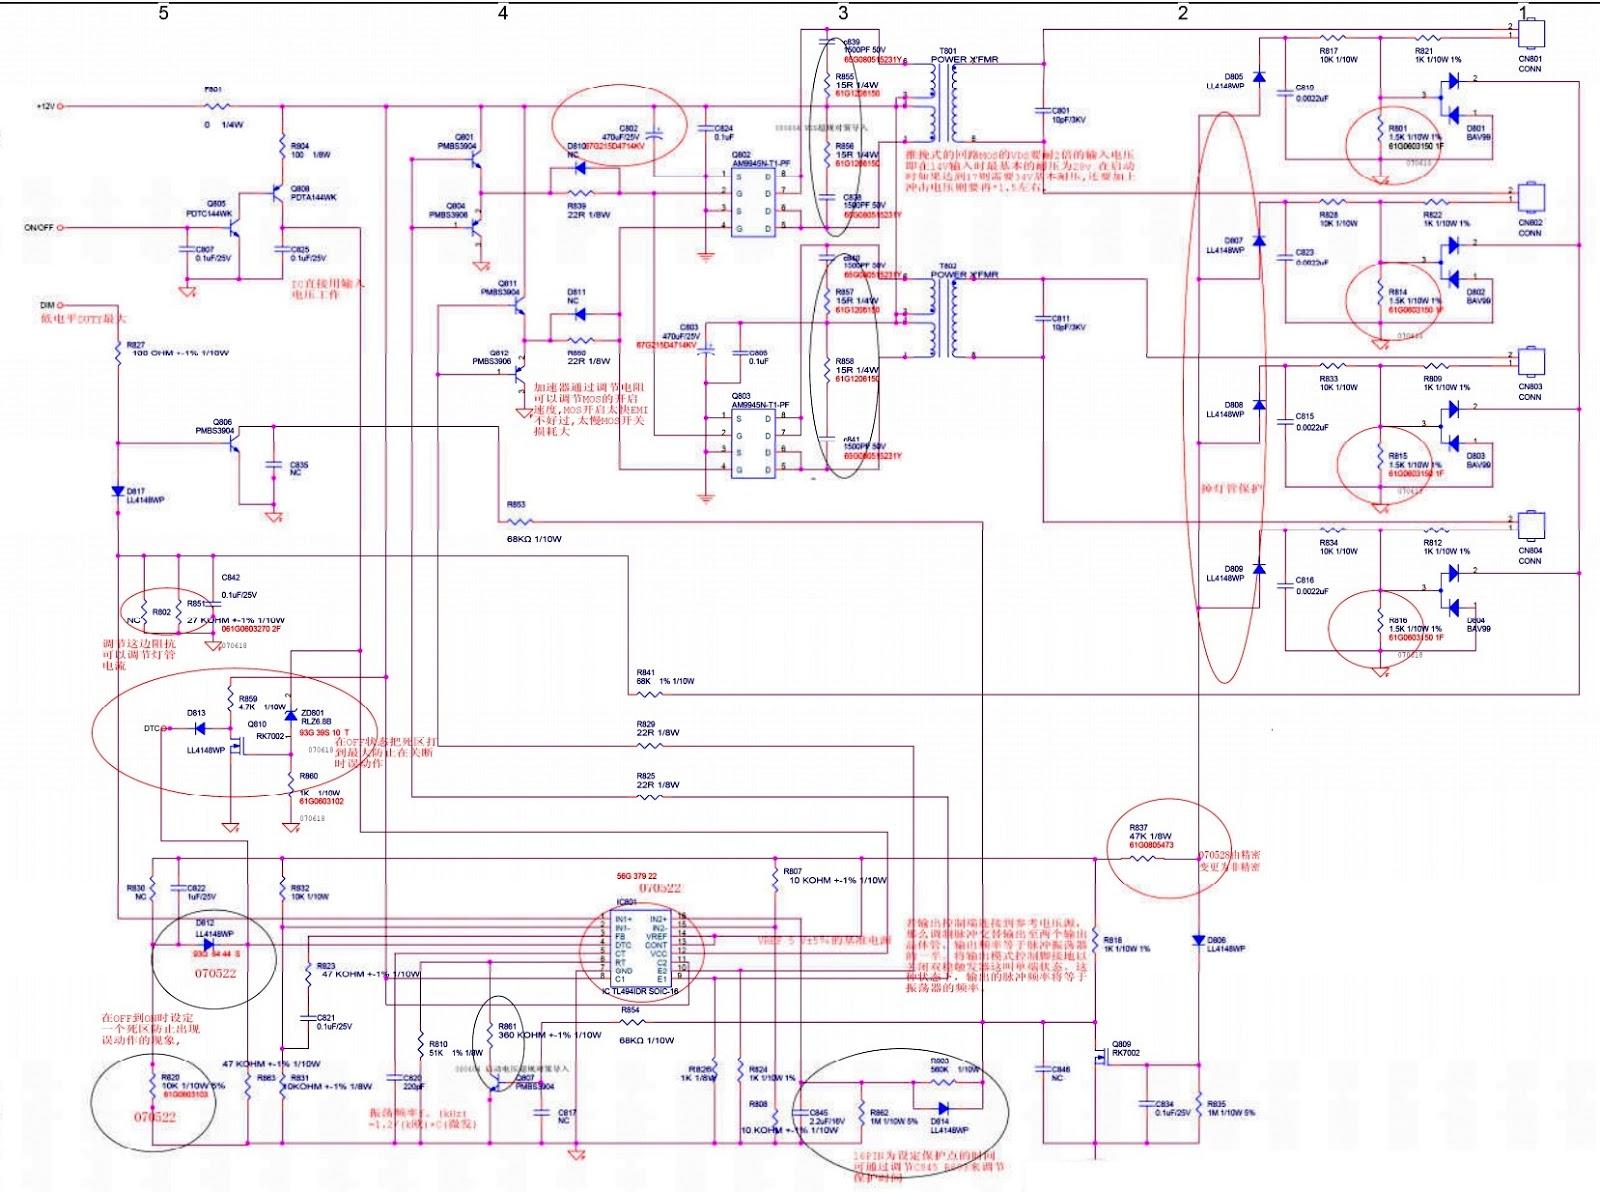 DIAGRAM] Kenwood Kna G510 Wiring Diagram FULL Version HD ... on kenwood kdc mp338 wiring, kenwood kvt 717dvd wiring, kenwood wiring connections, kenwood kdc 248u wiring, kenwood car stereo wiring diagrams, kenwood ddx6019 bluetooth, kenwood excelon ddx7015 wiring-diagram, kenwood ddx6019 harness, kenwood ddx6019 remote control, kenwood ddx6019 installation manual, kenwood usb cable diagram, kenwood model kdc wiring-diagram, kenwood kvt-516 wiring-diagram, kenwood ddx514 manual,